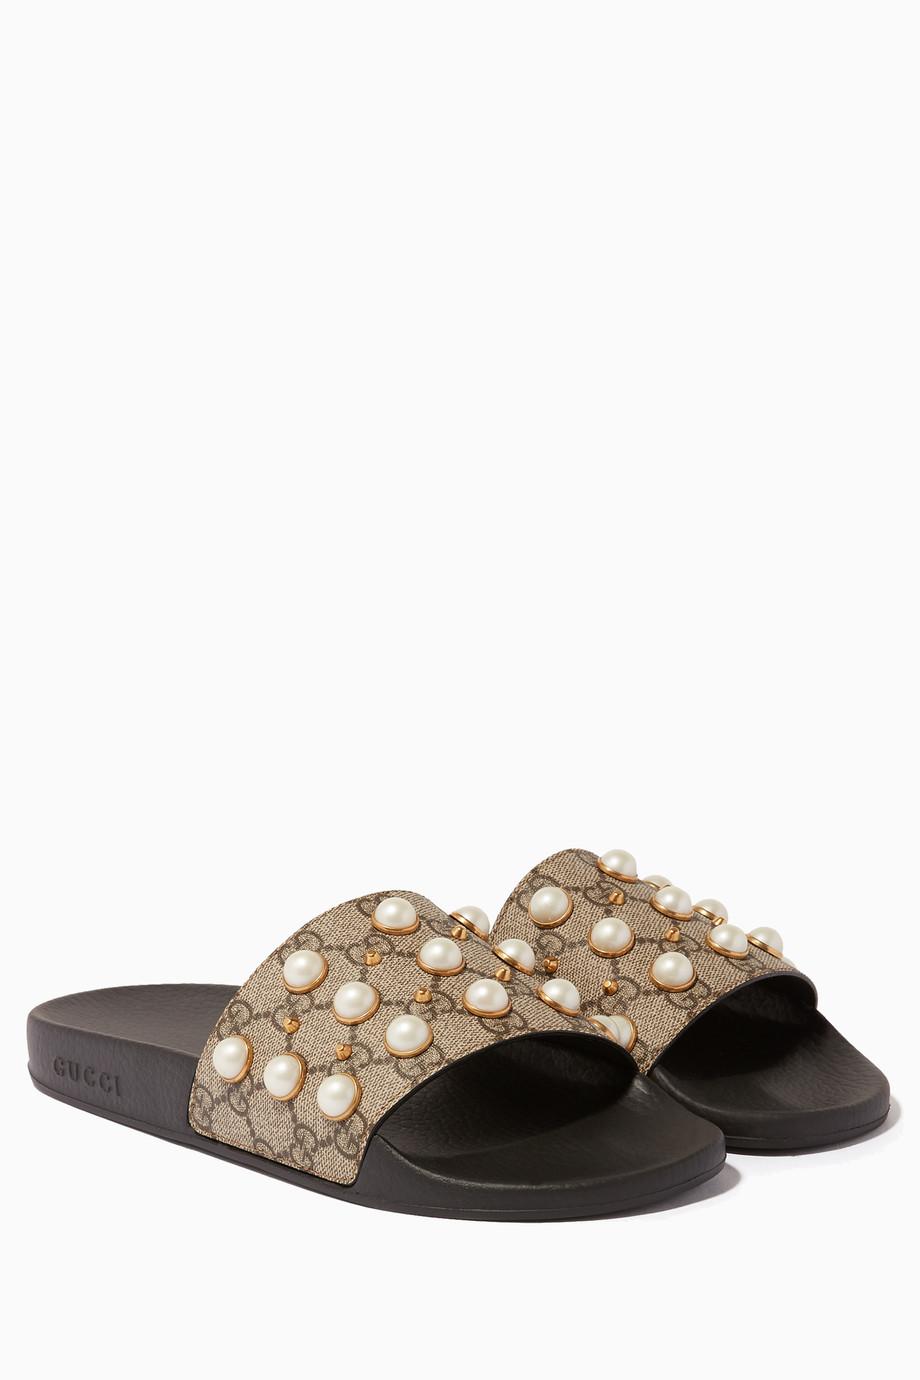 22028e294fe478 Shop Gucci Neutral Beige GG Supreme Pearl Slides for Women